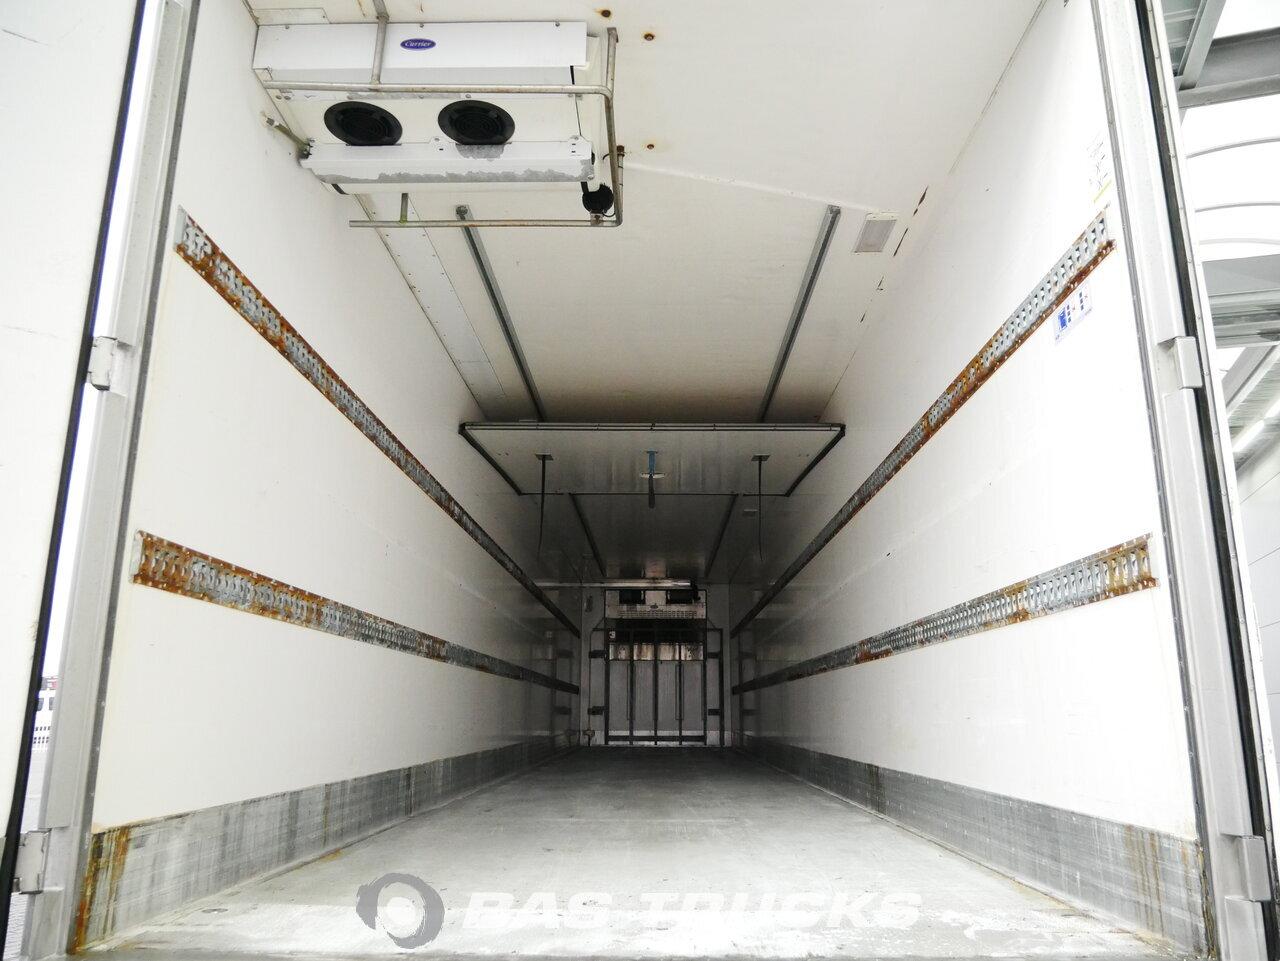 foto di Usato Semirimorchio Lecsor Carrier Vector 1850mt Bi-temp Multitemp Doppelverdampfer Trennwand assi 2011